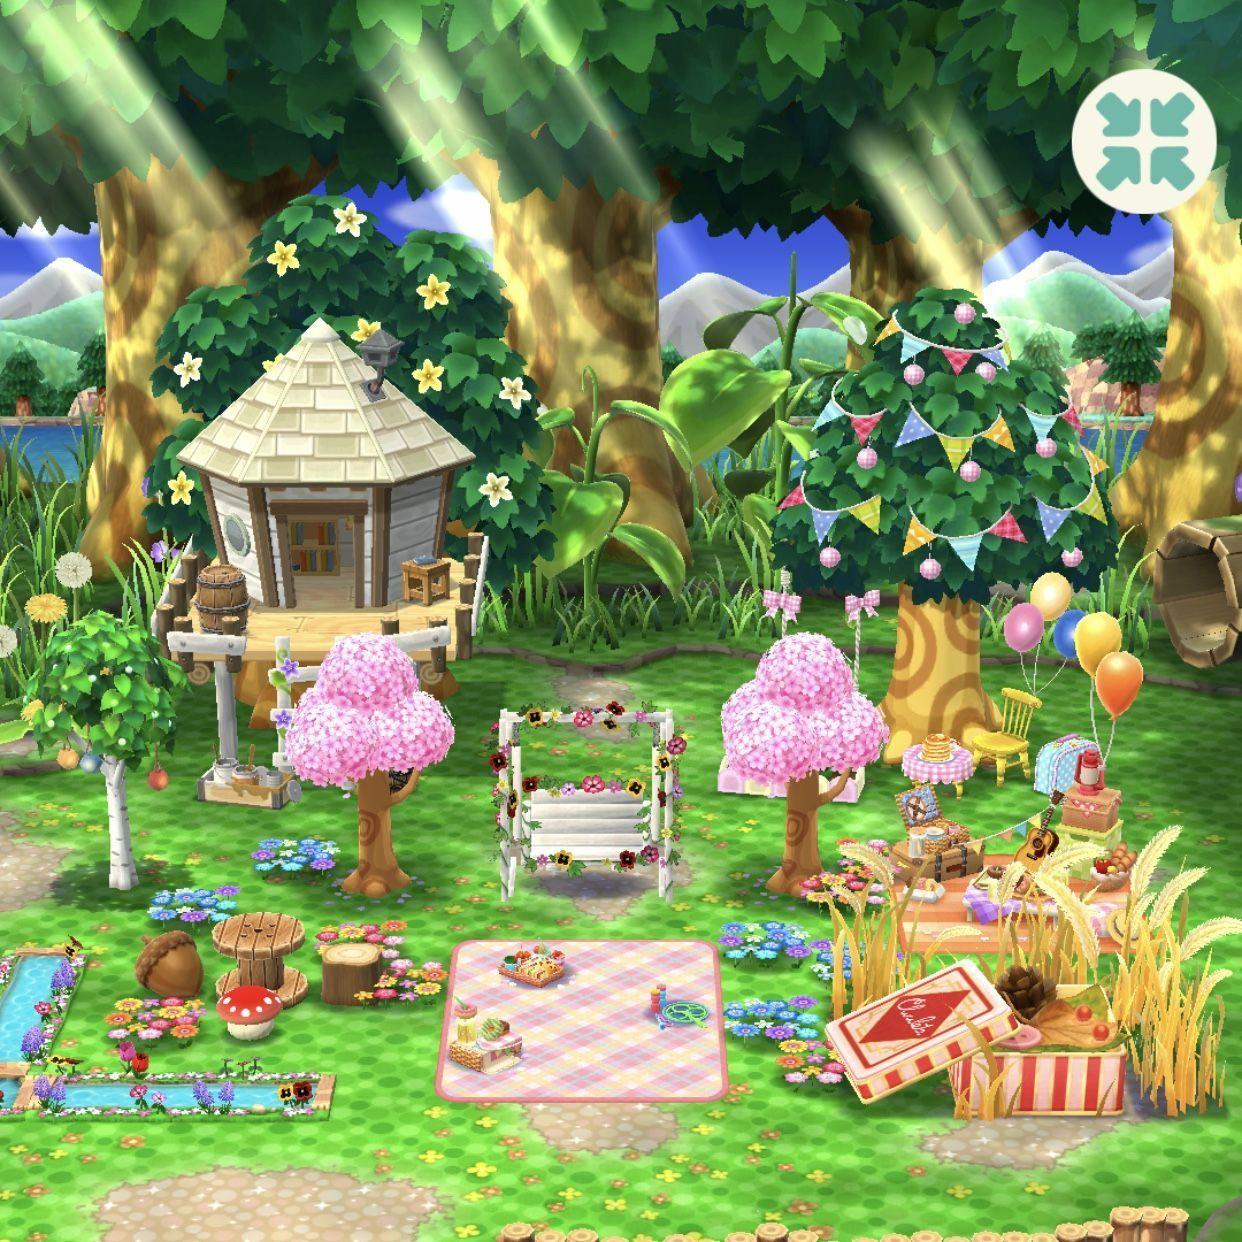 Acpc Friend Id 77257600433 Campsiteideas Animal Crossing Pocket Camp Campsite Idea Campsiteid Animal Crossing Animal Crossing Pocket Camp Animal Crossing Pc